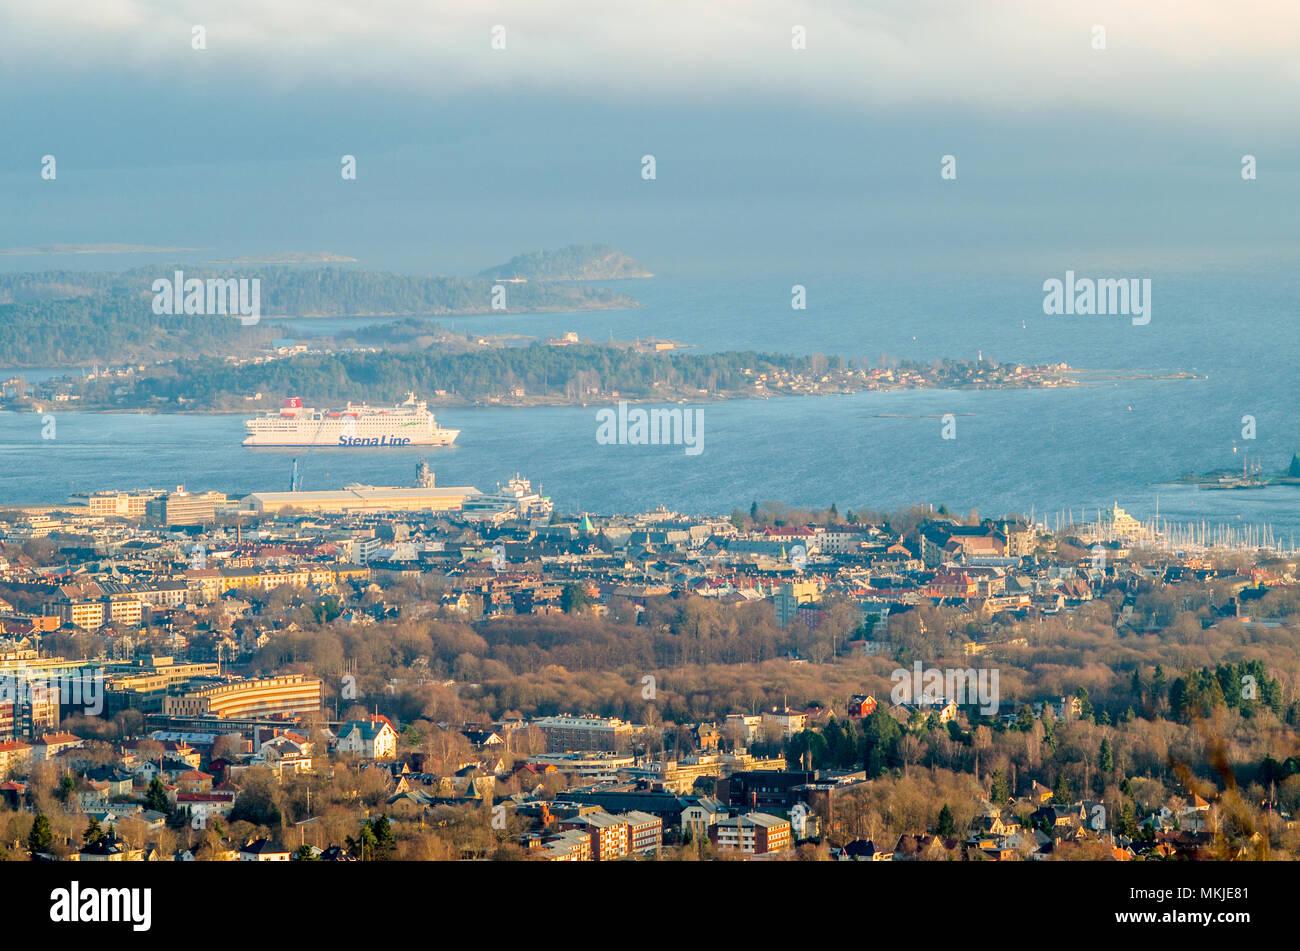 Stena Line big ro-ro ferry leaves Oslo en route to Denmark. - Stock Image